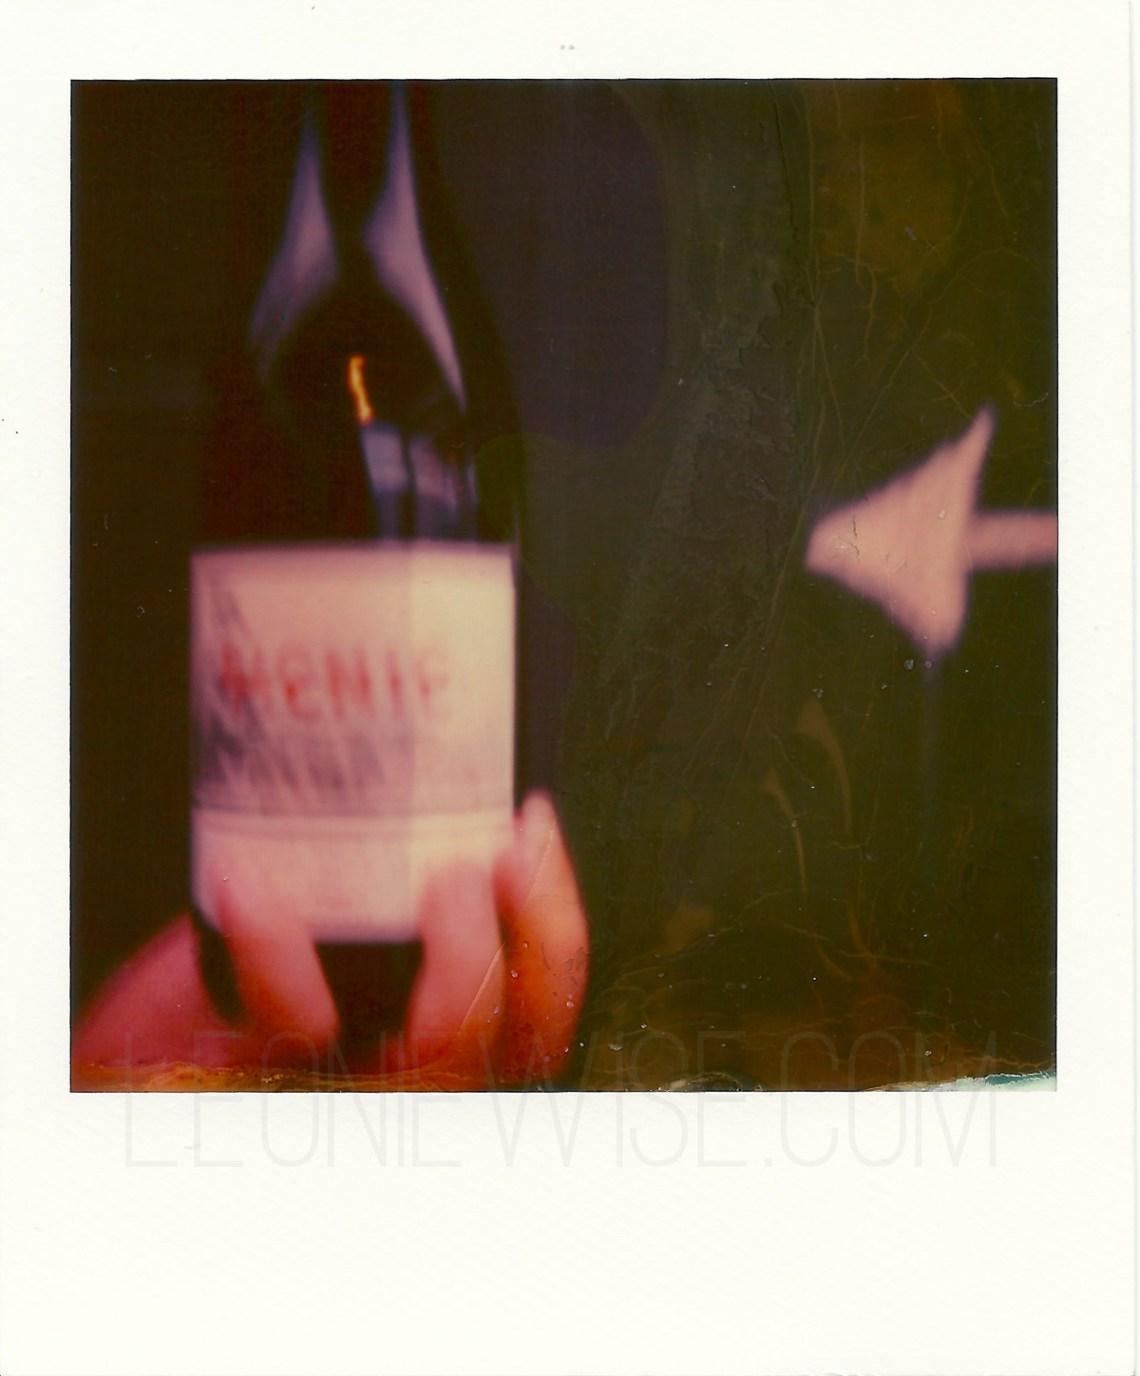 TwoPaddocksPinotNoir_Polaroid-SX70_Impossible-PX70_leoniewise-1